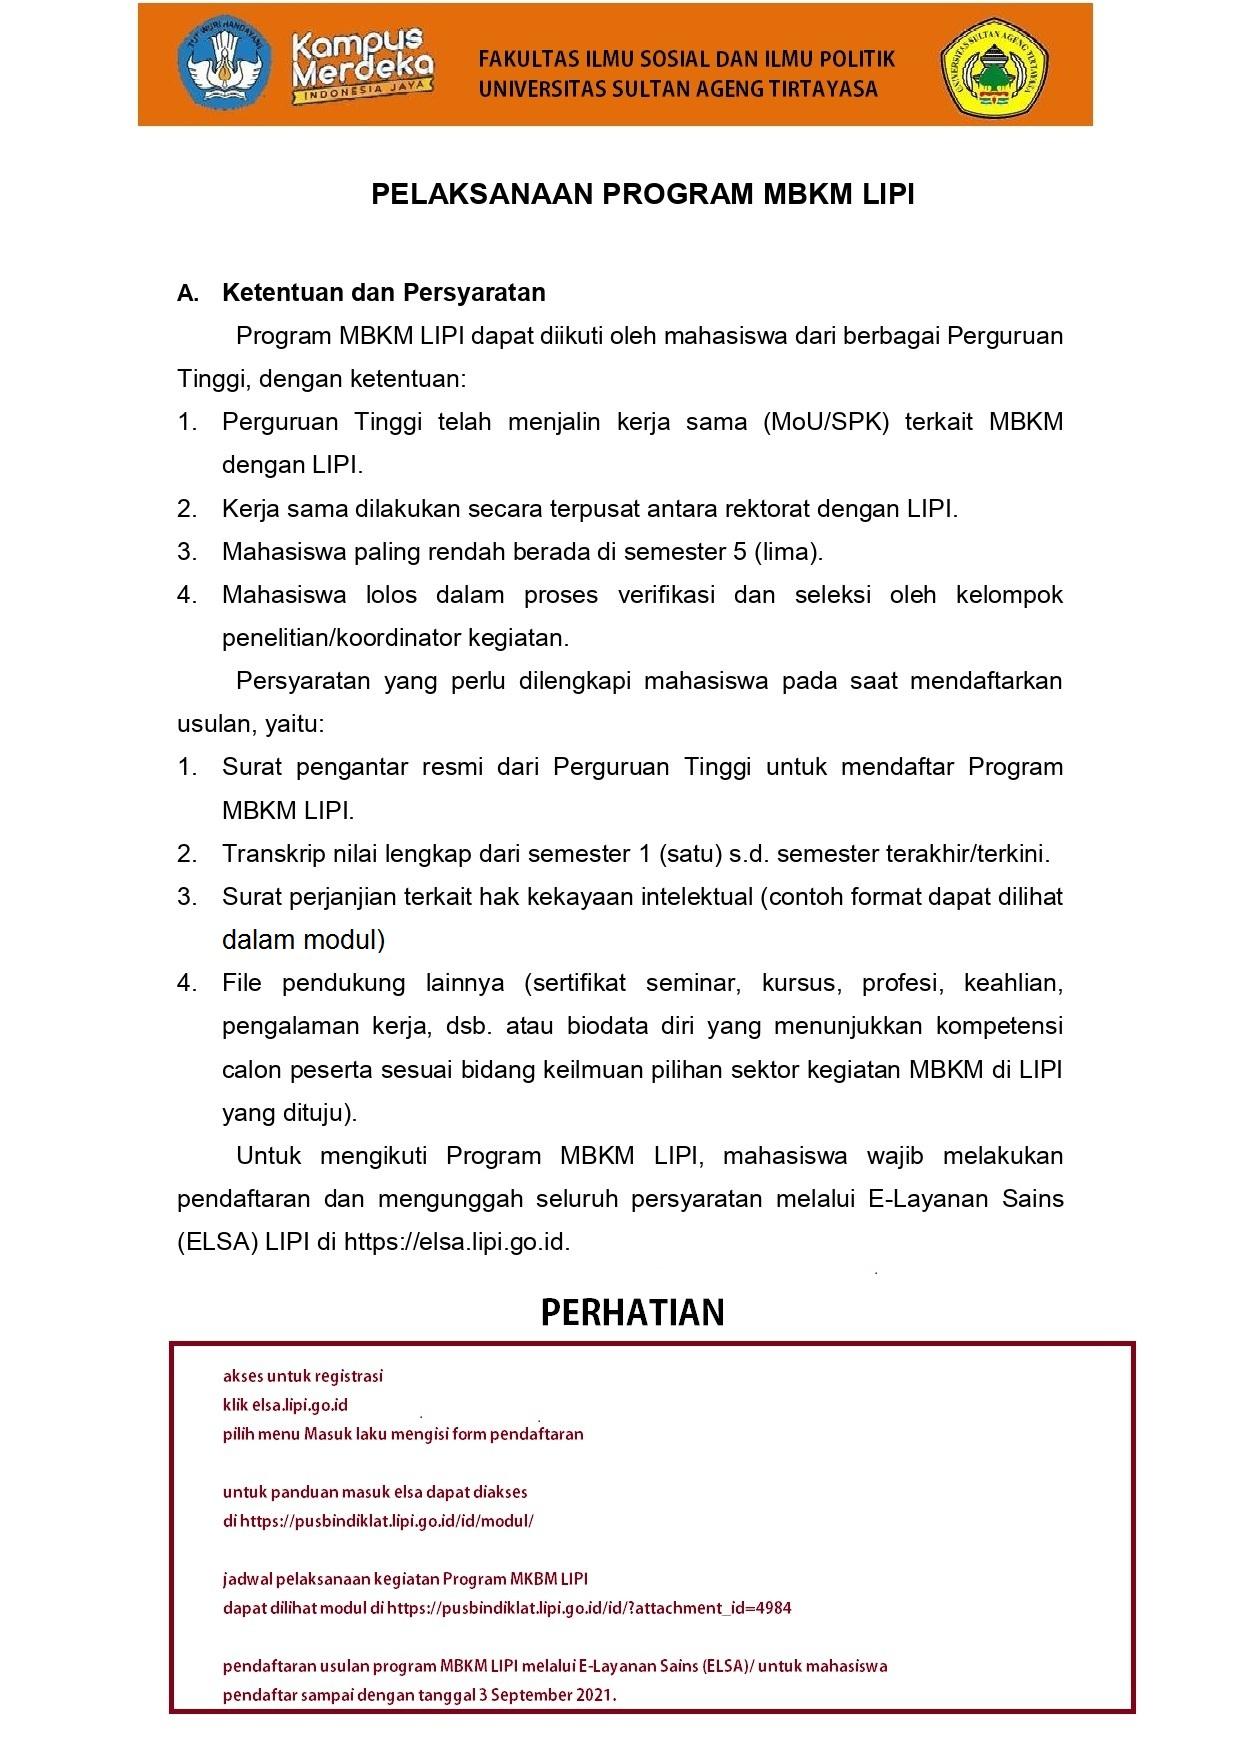 Program MBKM LIPI tahun 2021